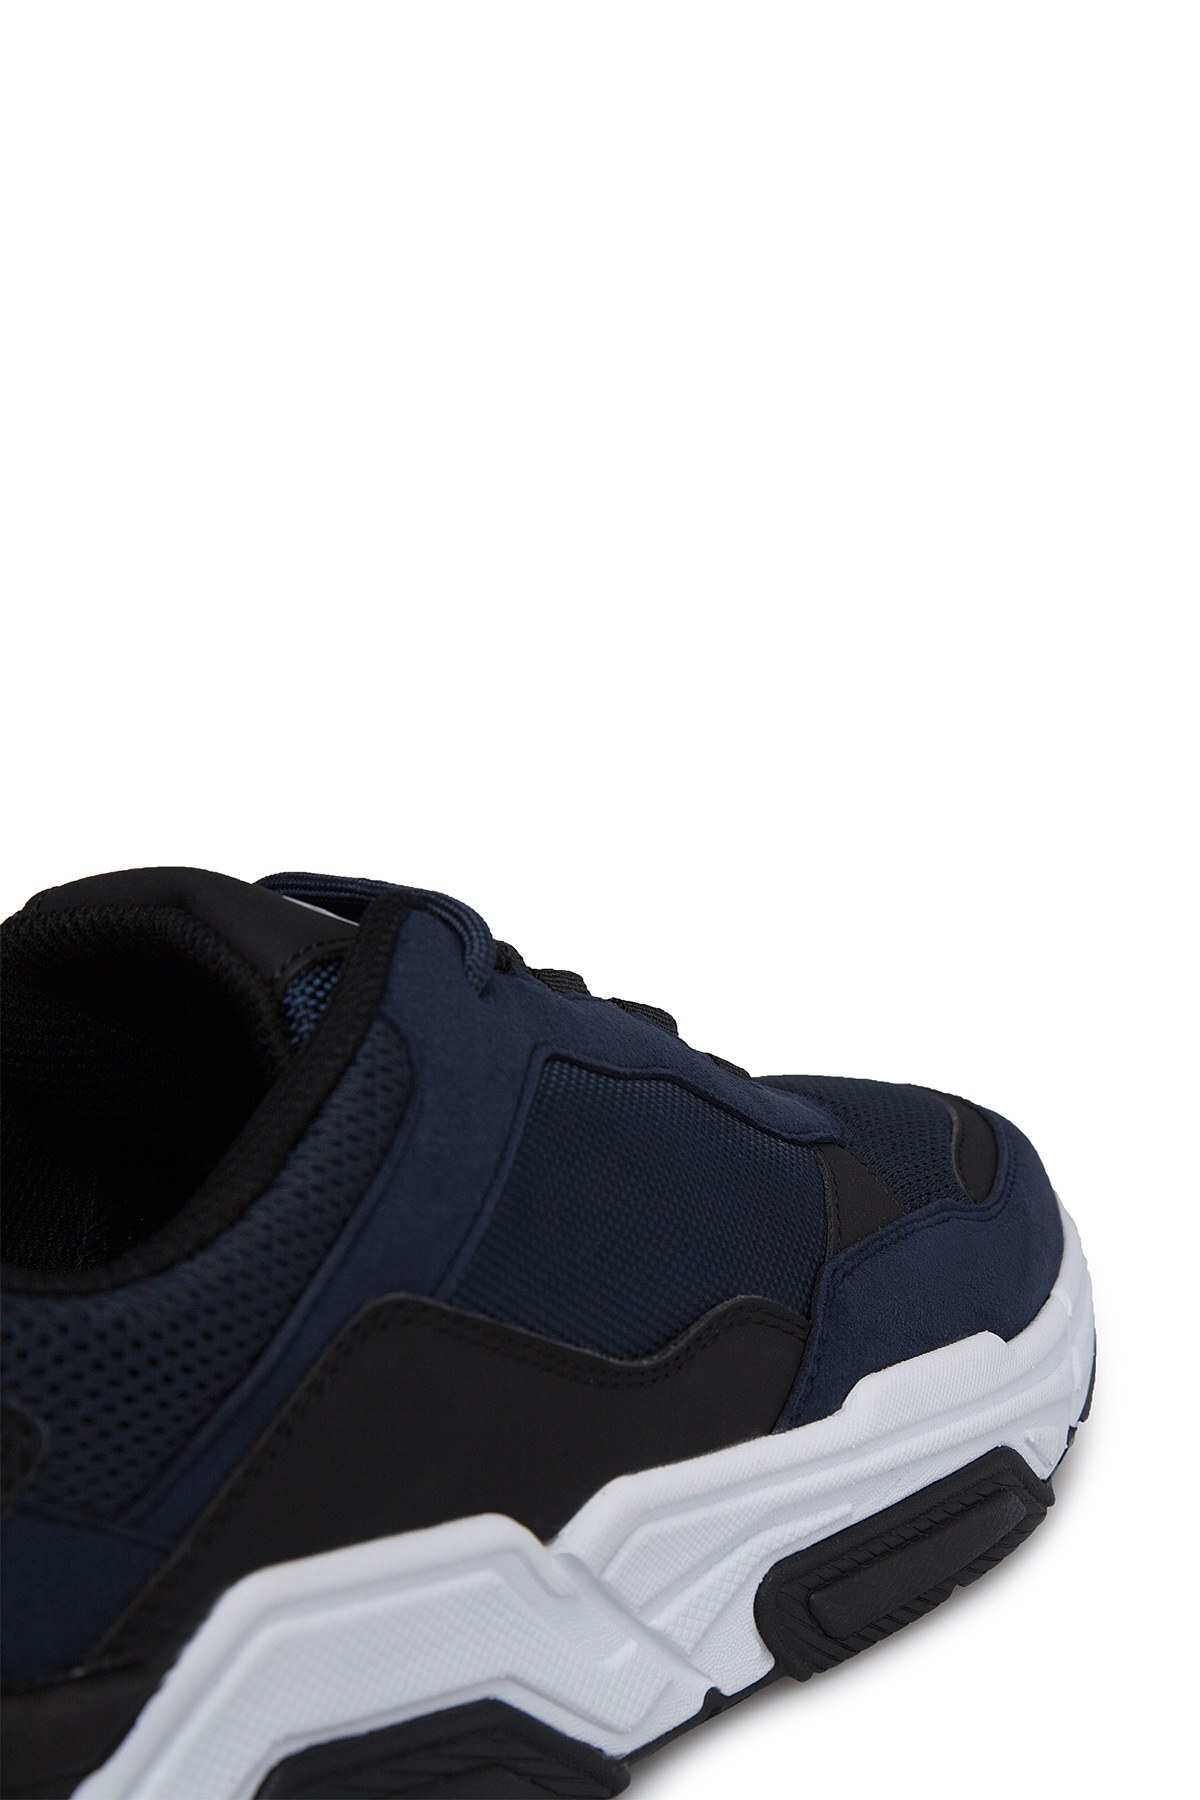 Armani Exchange Erkek Ayakkabı XUX026 XV070 A138 LACİVERT